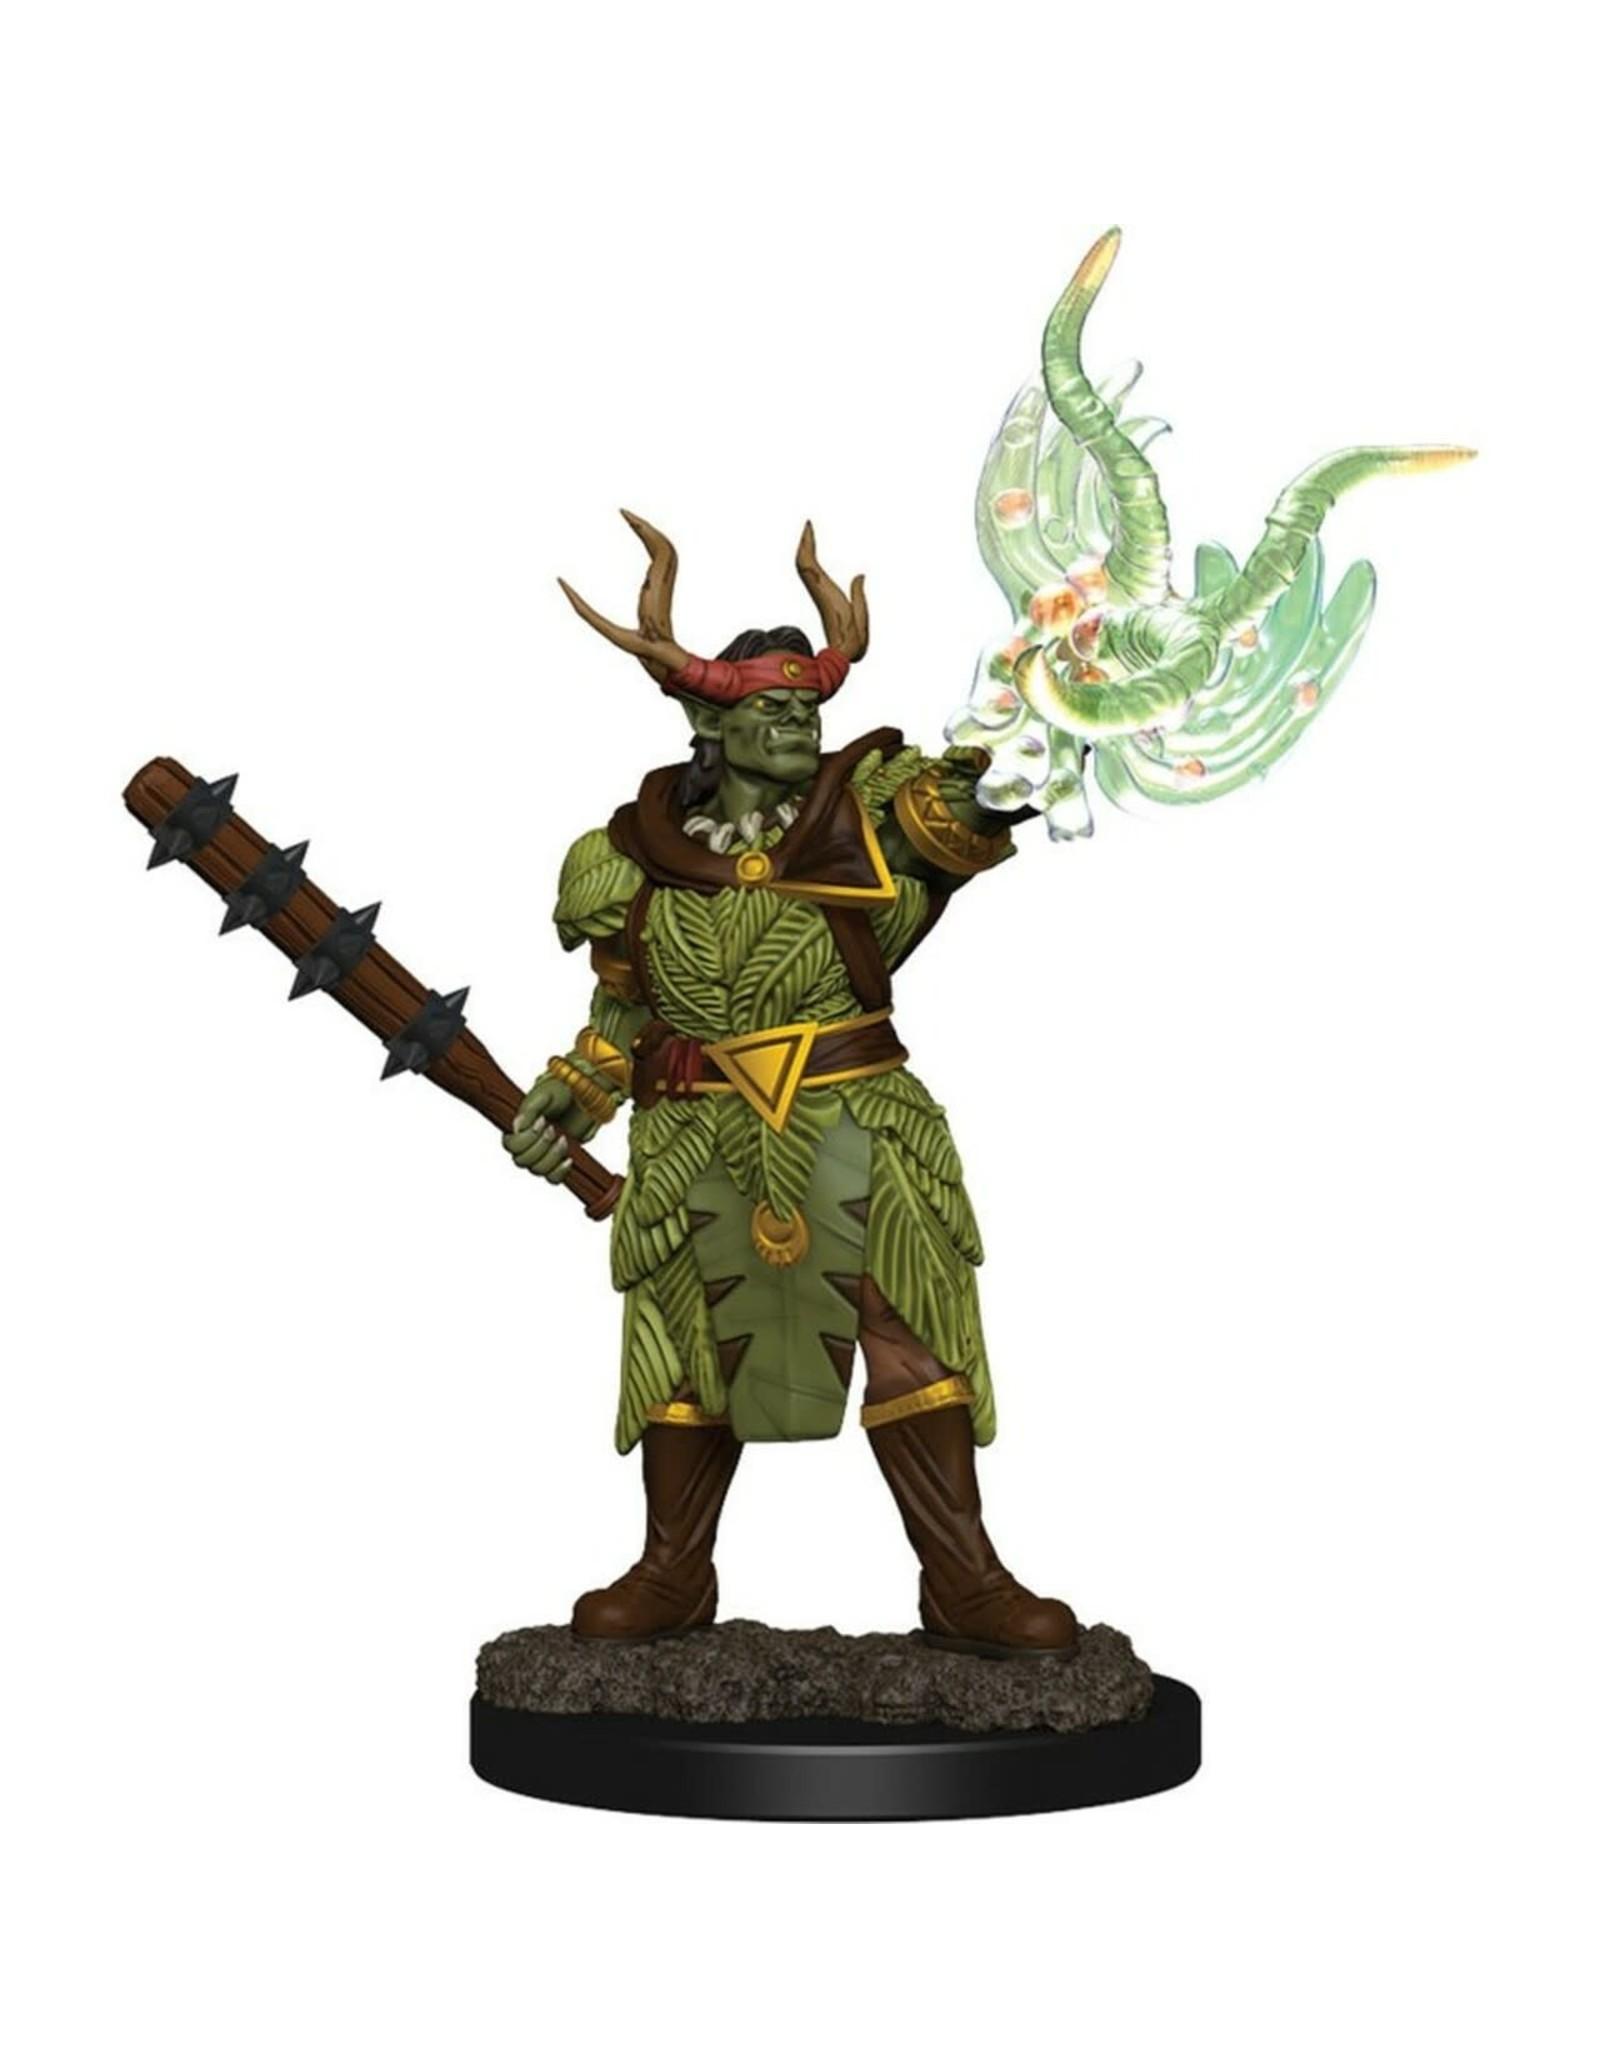 WizKids Premium Painted Male Half-Orc Druid - Wave 2